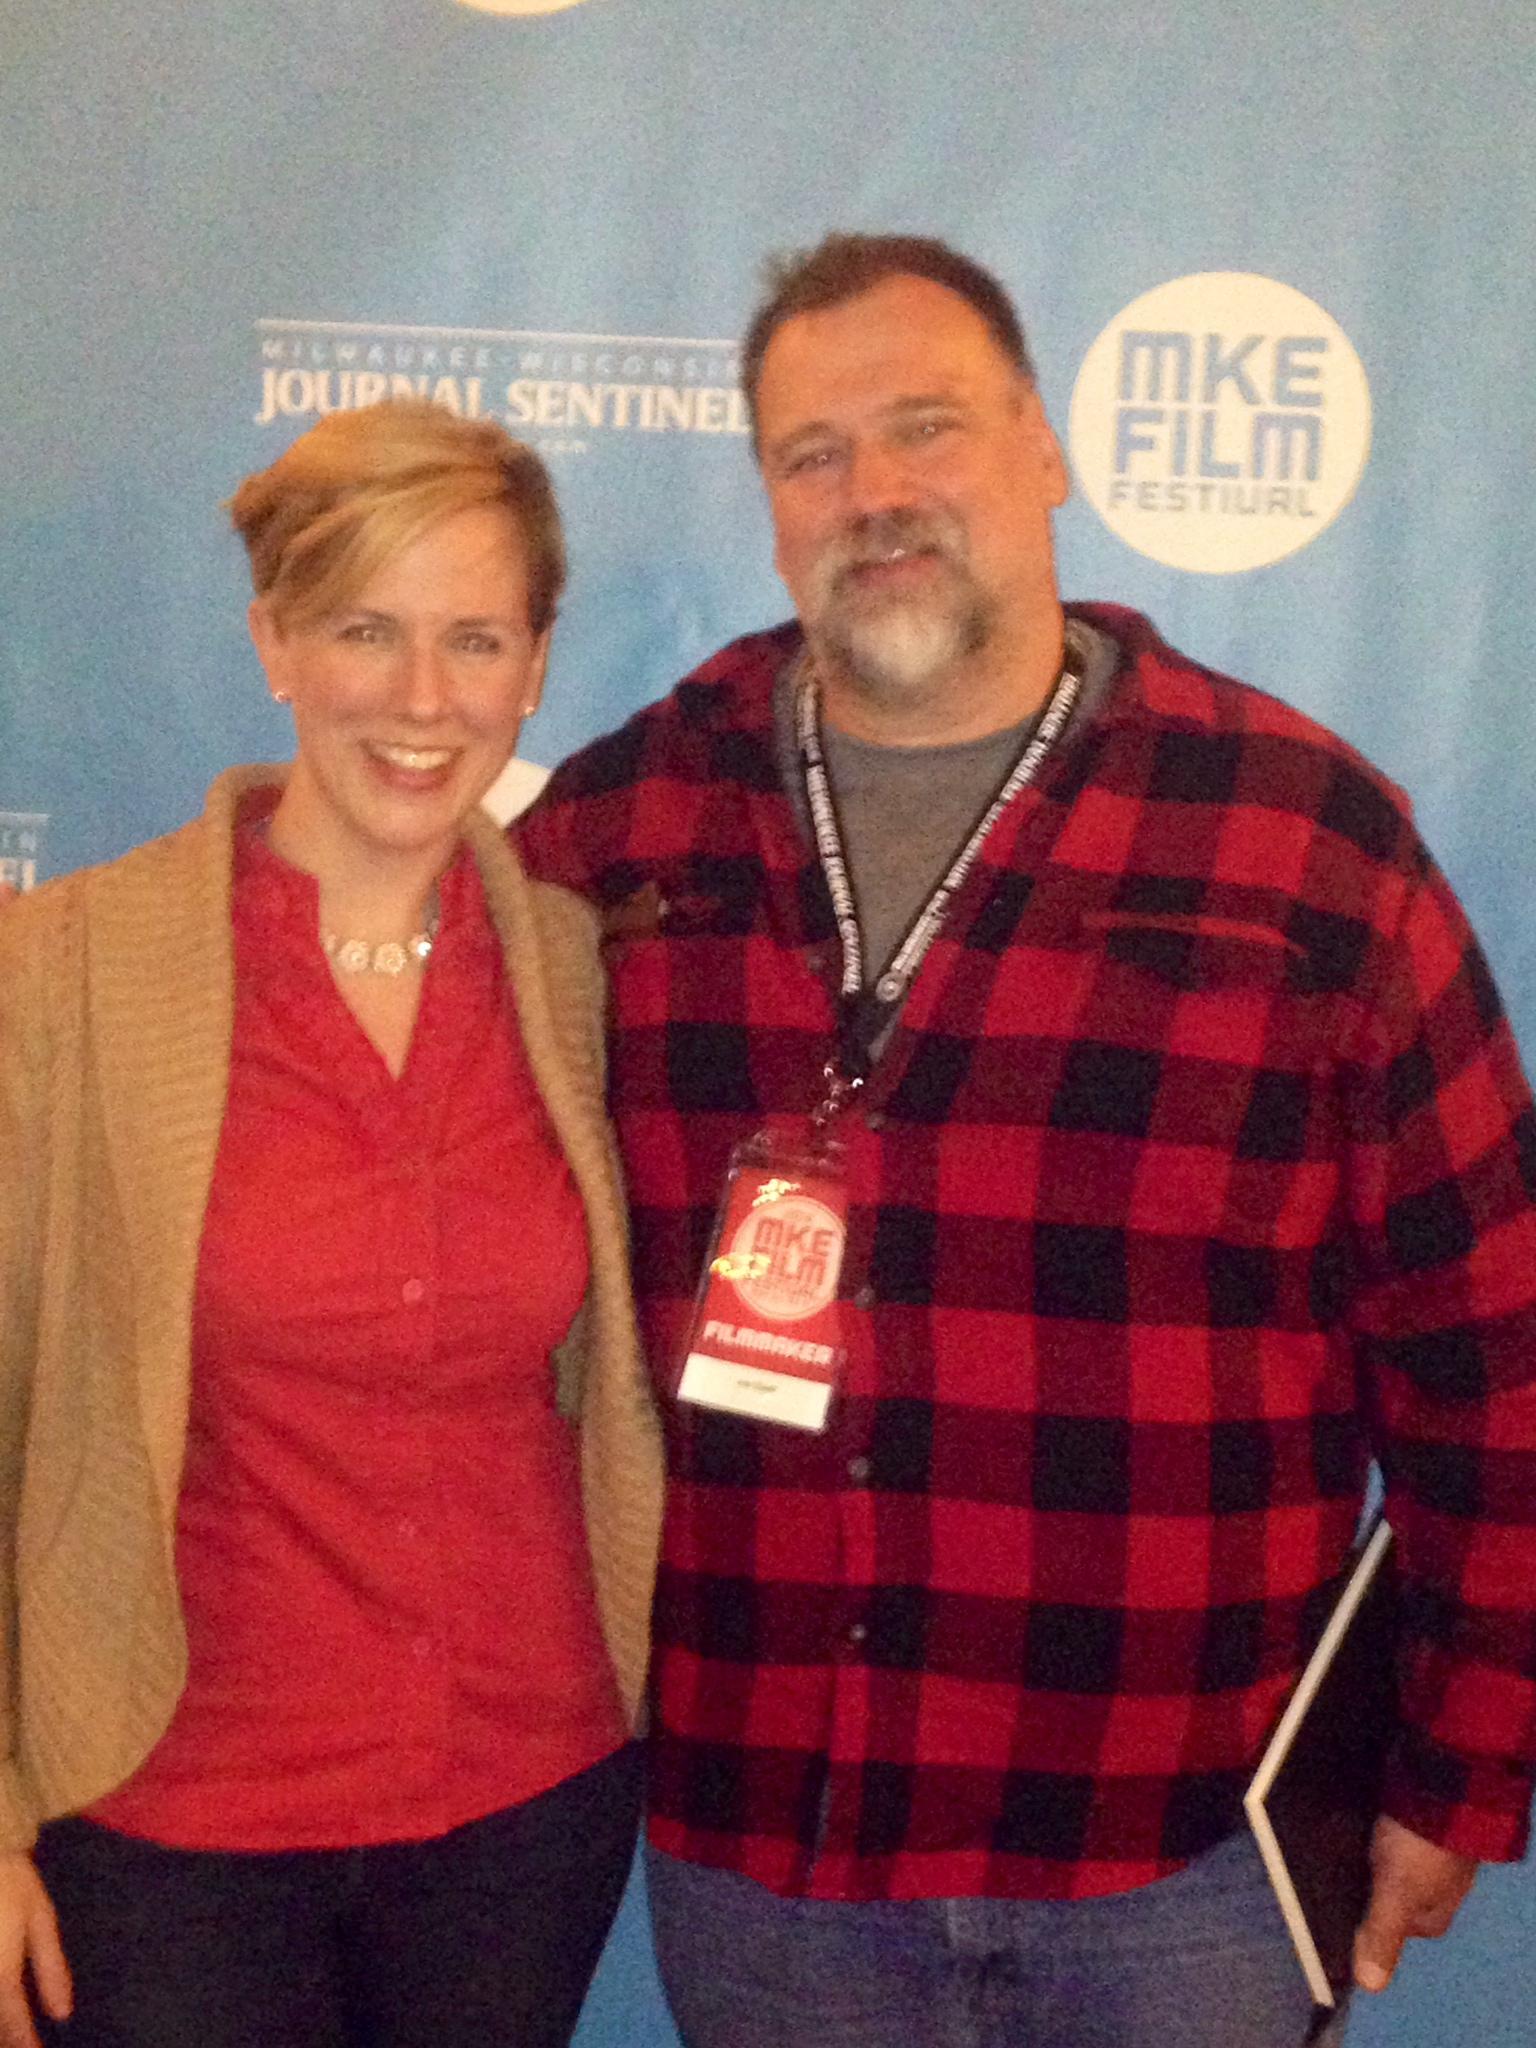 Executive Producer Grace McPhillips and Director Josef Steiff.